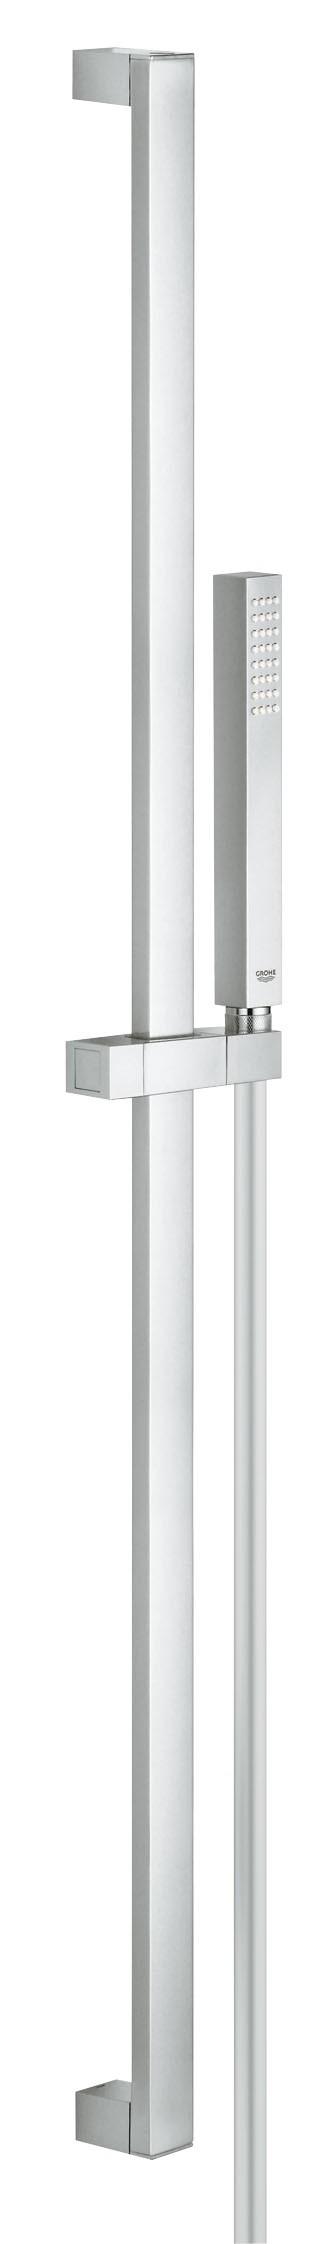 Душевой гарнитур Grohe 27700000 Euphoria Cube (ручной душ, штанга 900 мм, шланг 1750 мм), хром